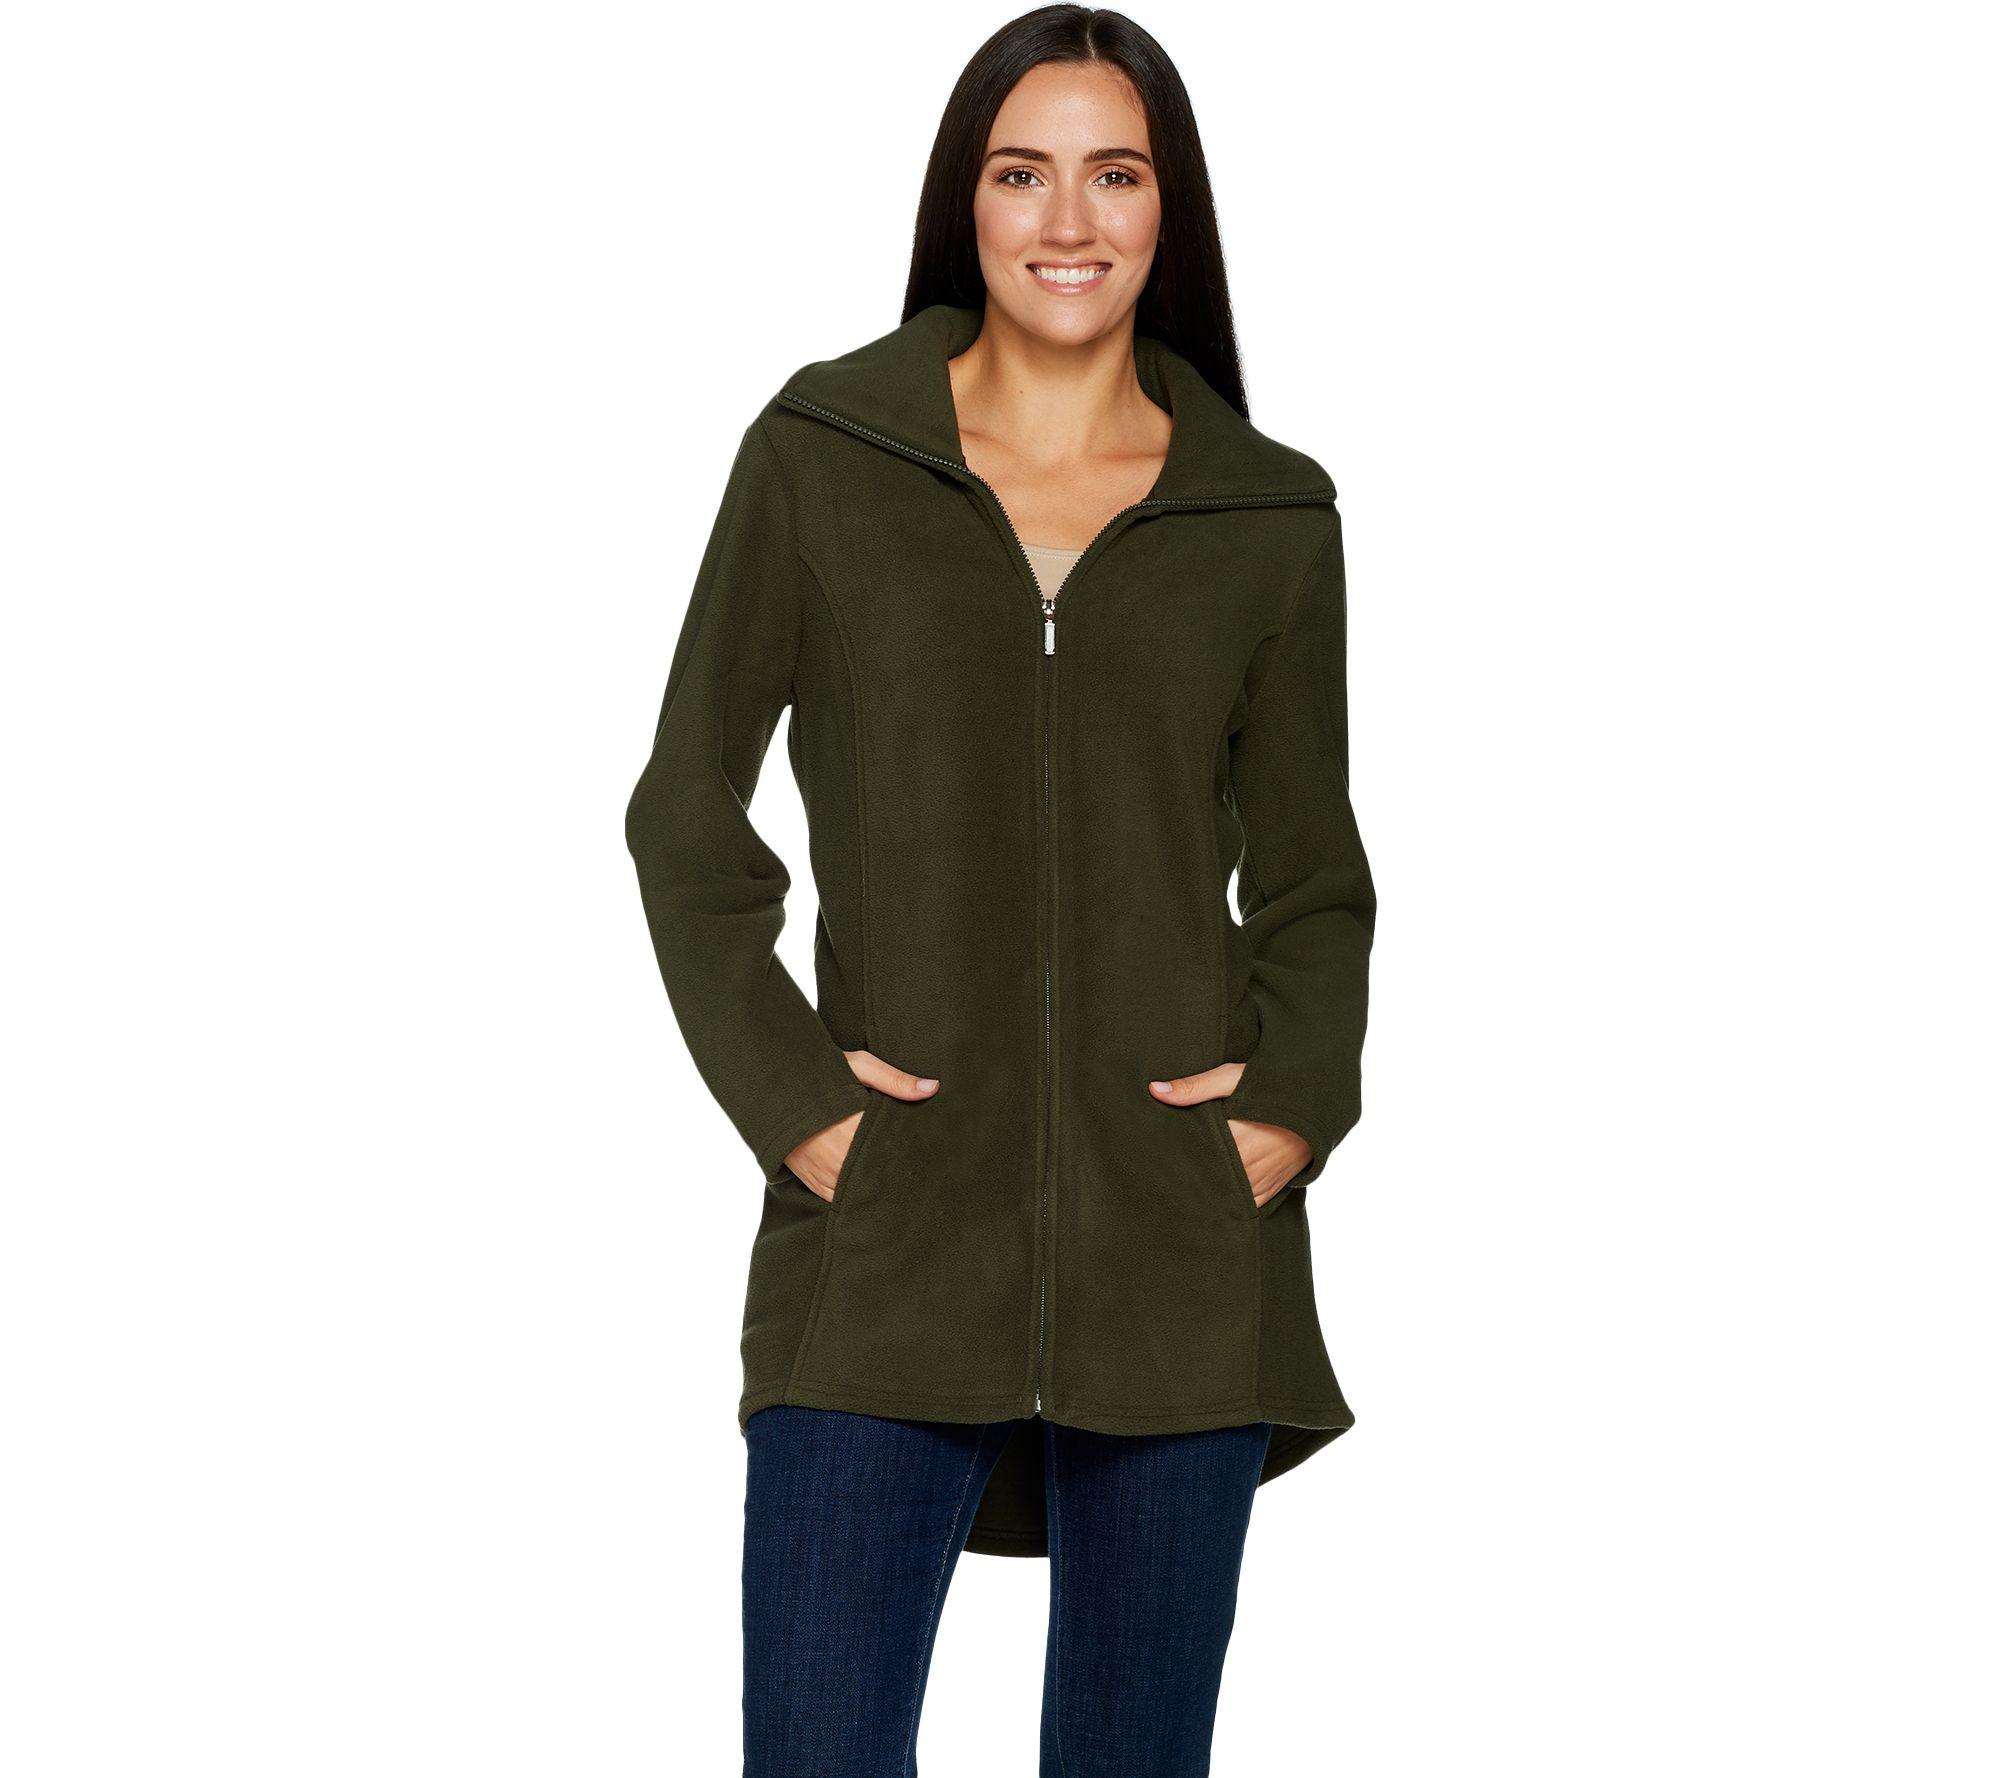 50d21480f30 Fleece Zip Front Long Sleeve Jacket with Hi-Low Hem - Page 1 — QVC.com